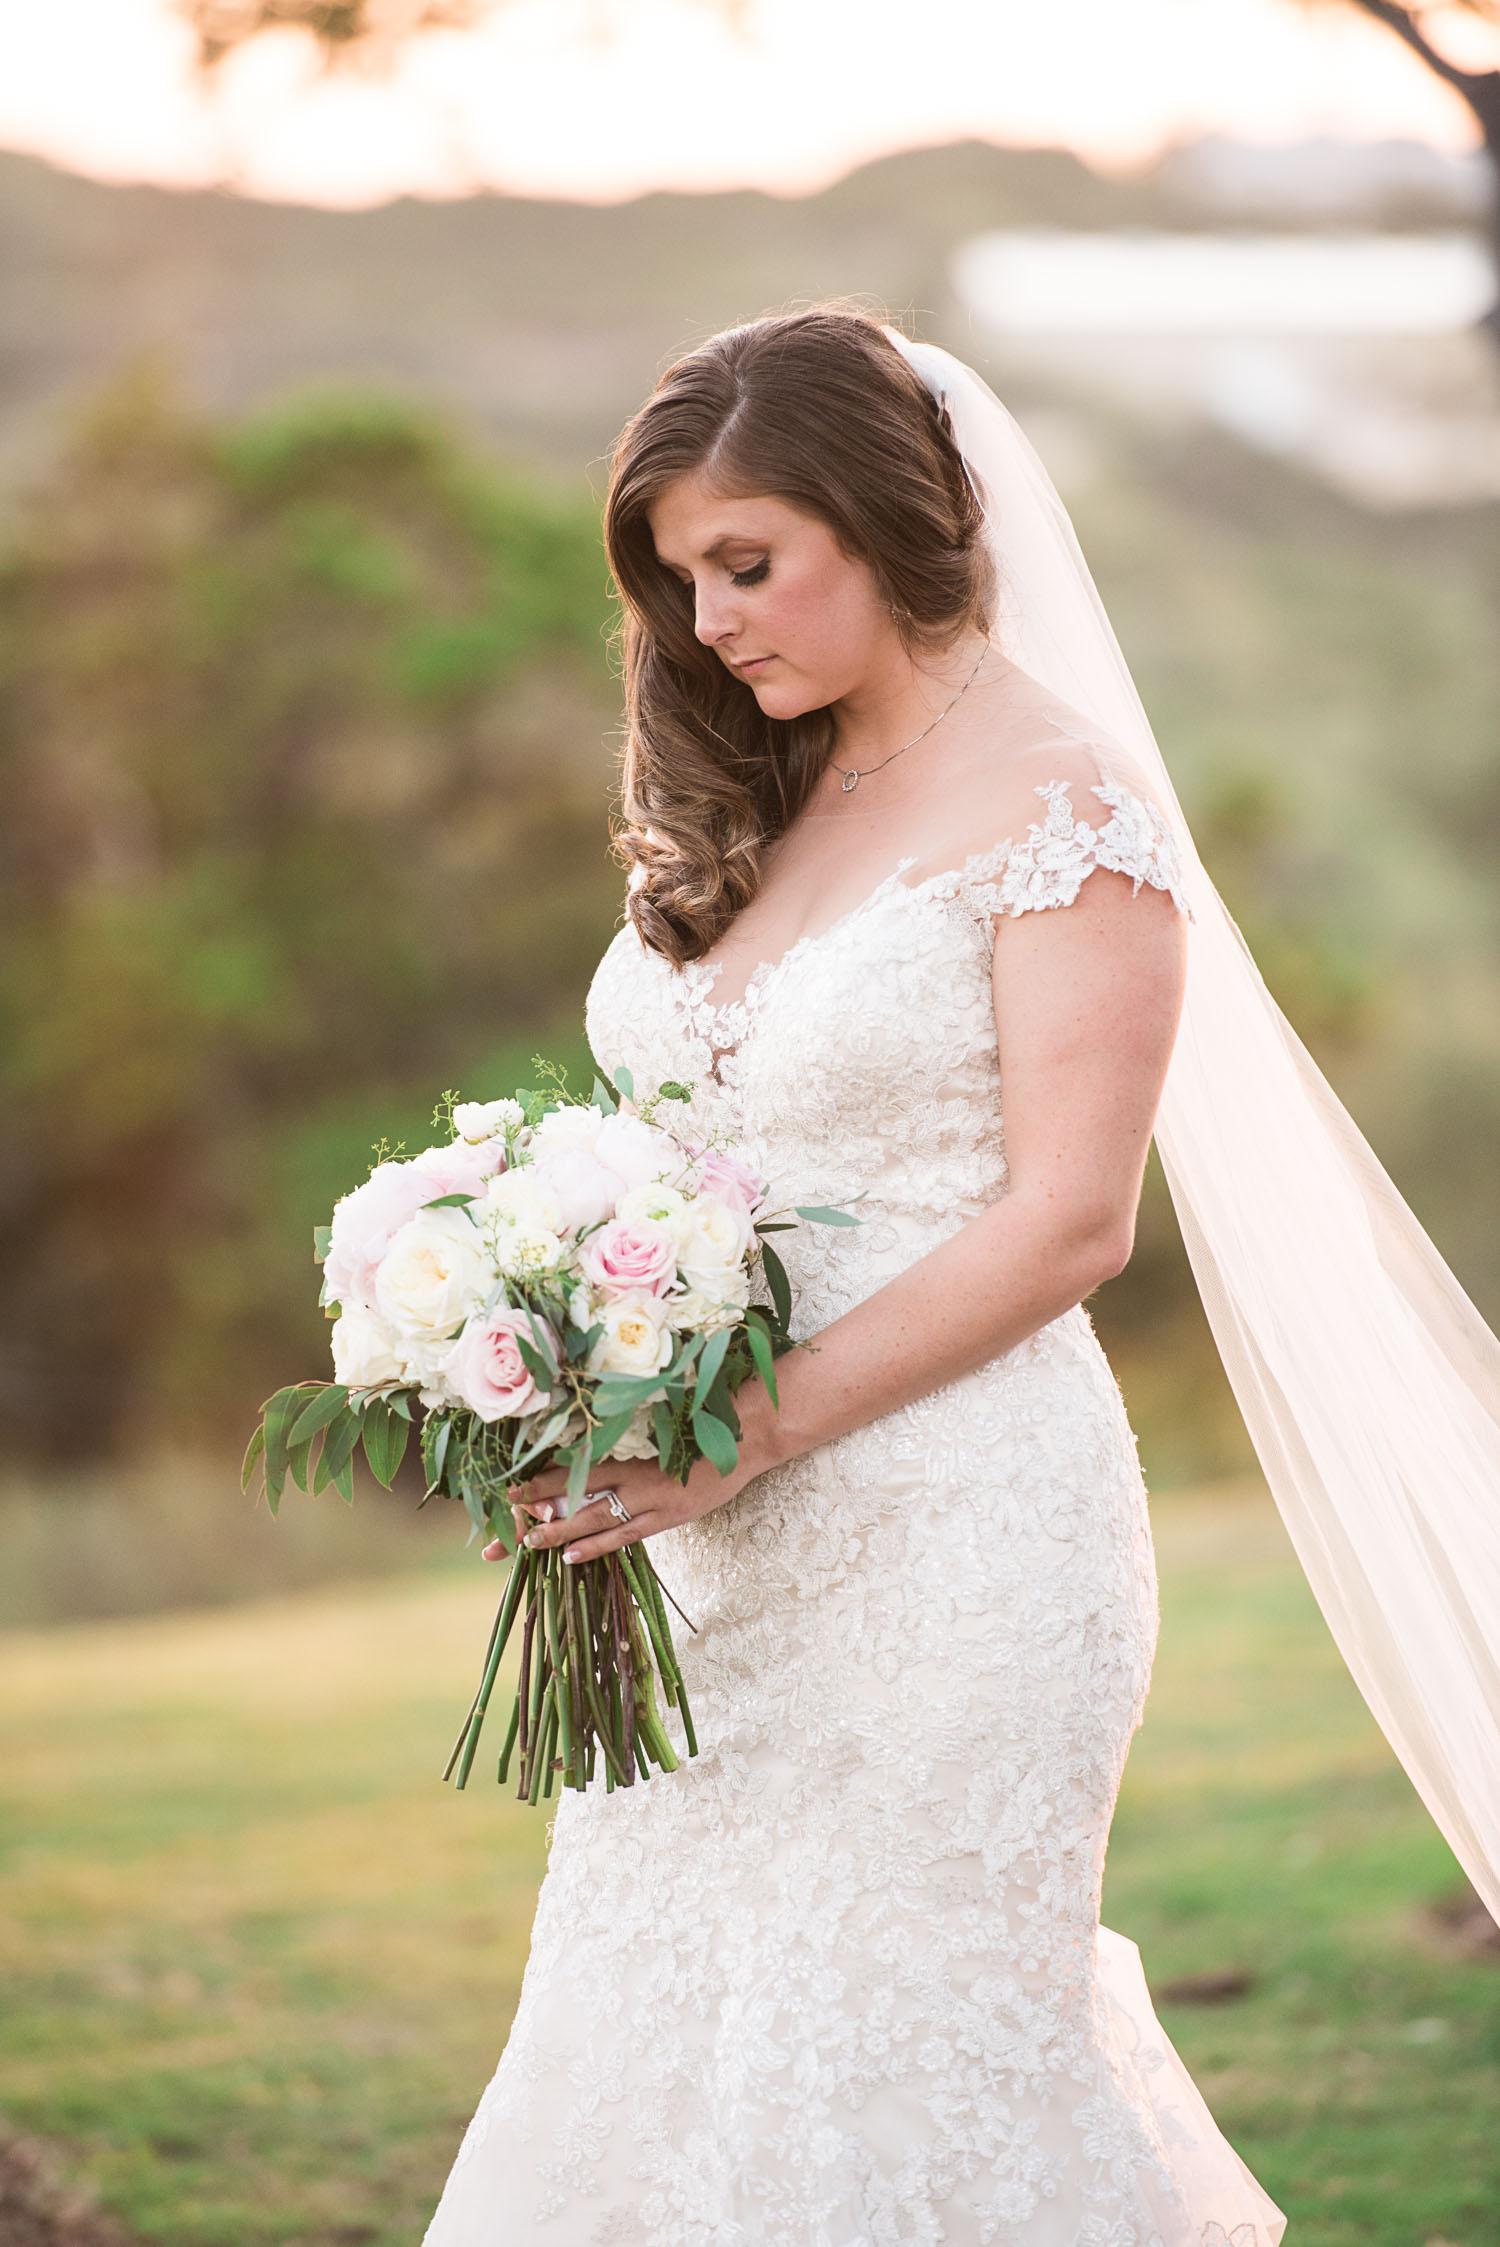 Hinton Wedding at Canyonwood Ridge Dripping Springs Texas Wedding Photography-155.jpg